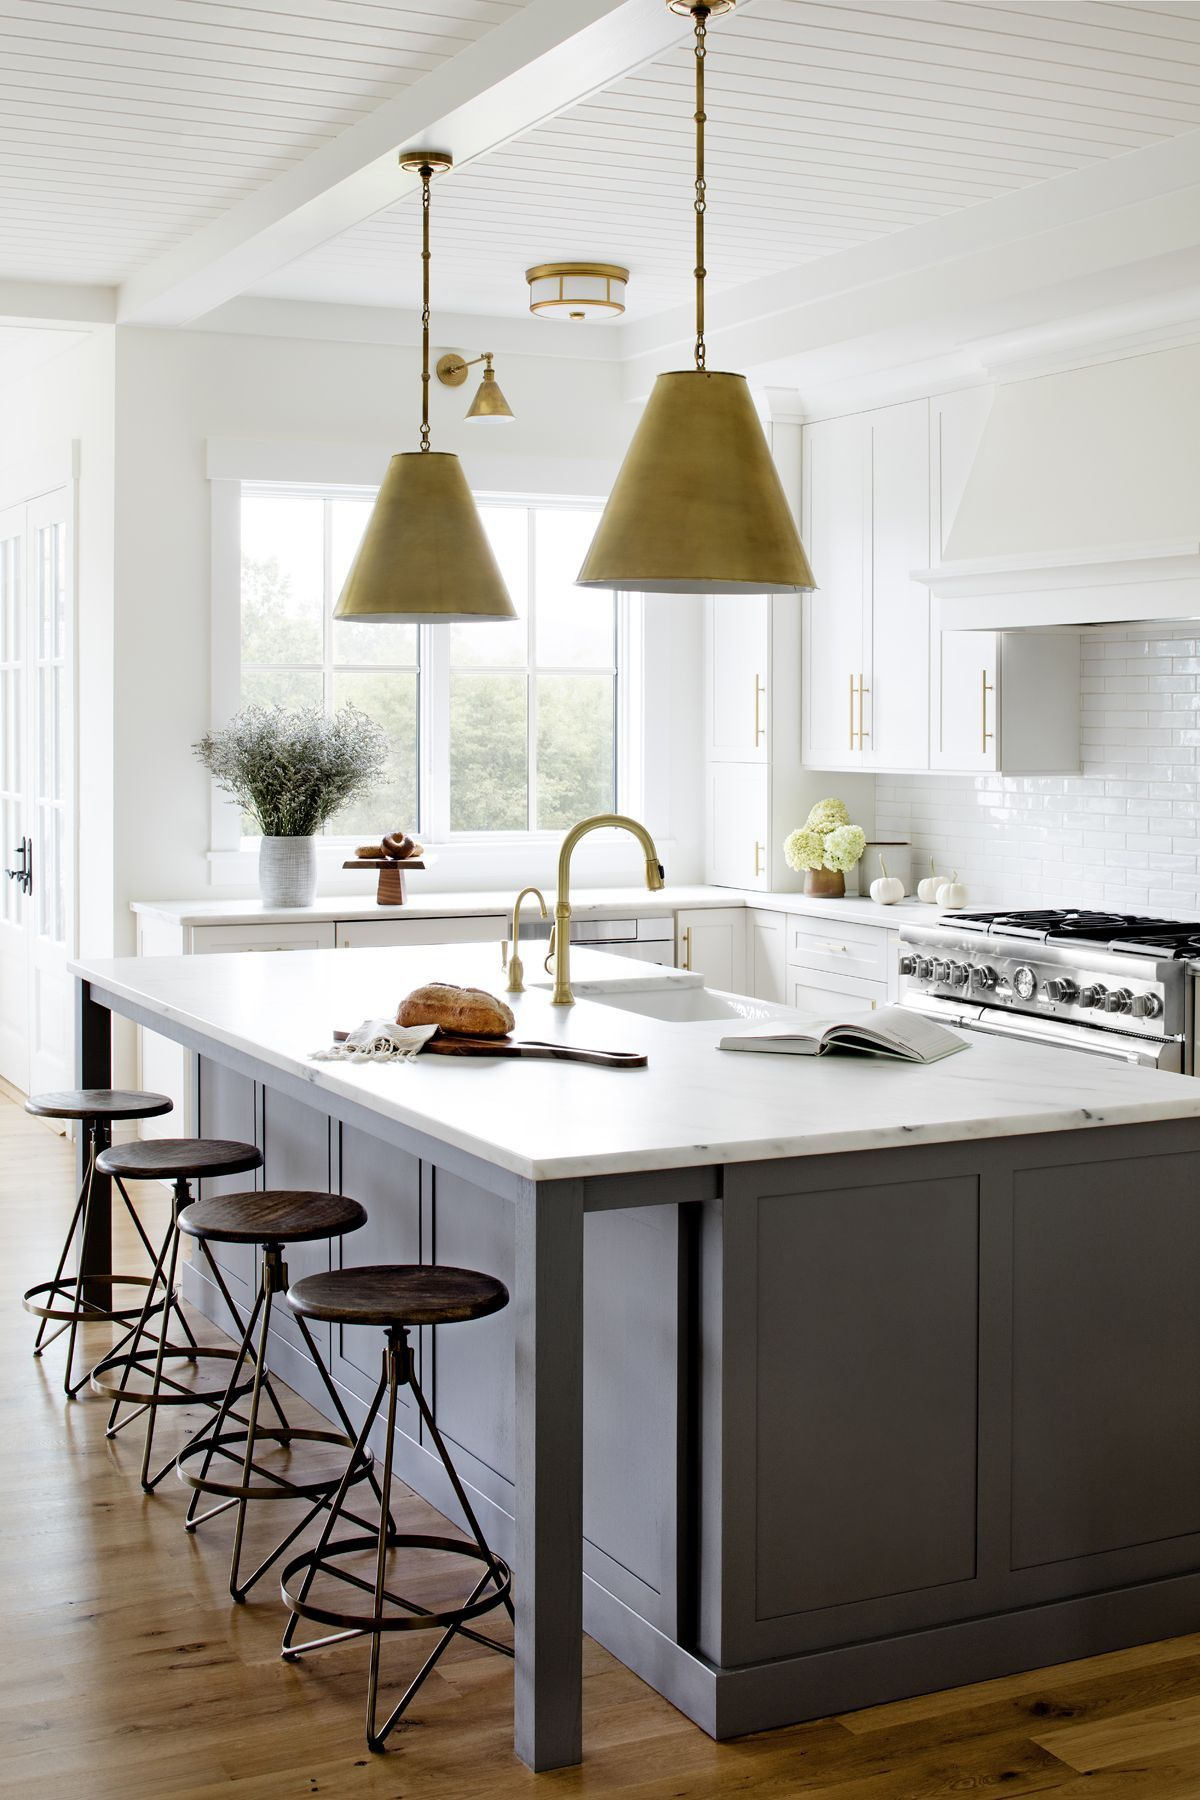 Elegant Modern Farmhouse Grey Kitchen Cabinets The Most Stylish In Addition To Interesting Modern Farmhouse Grey Kitchen Cabinets Intended For Really Encoura